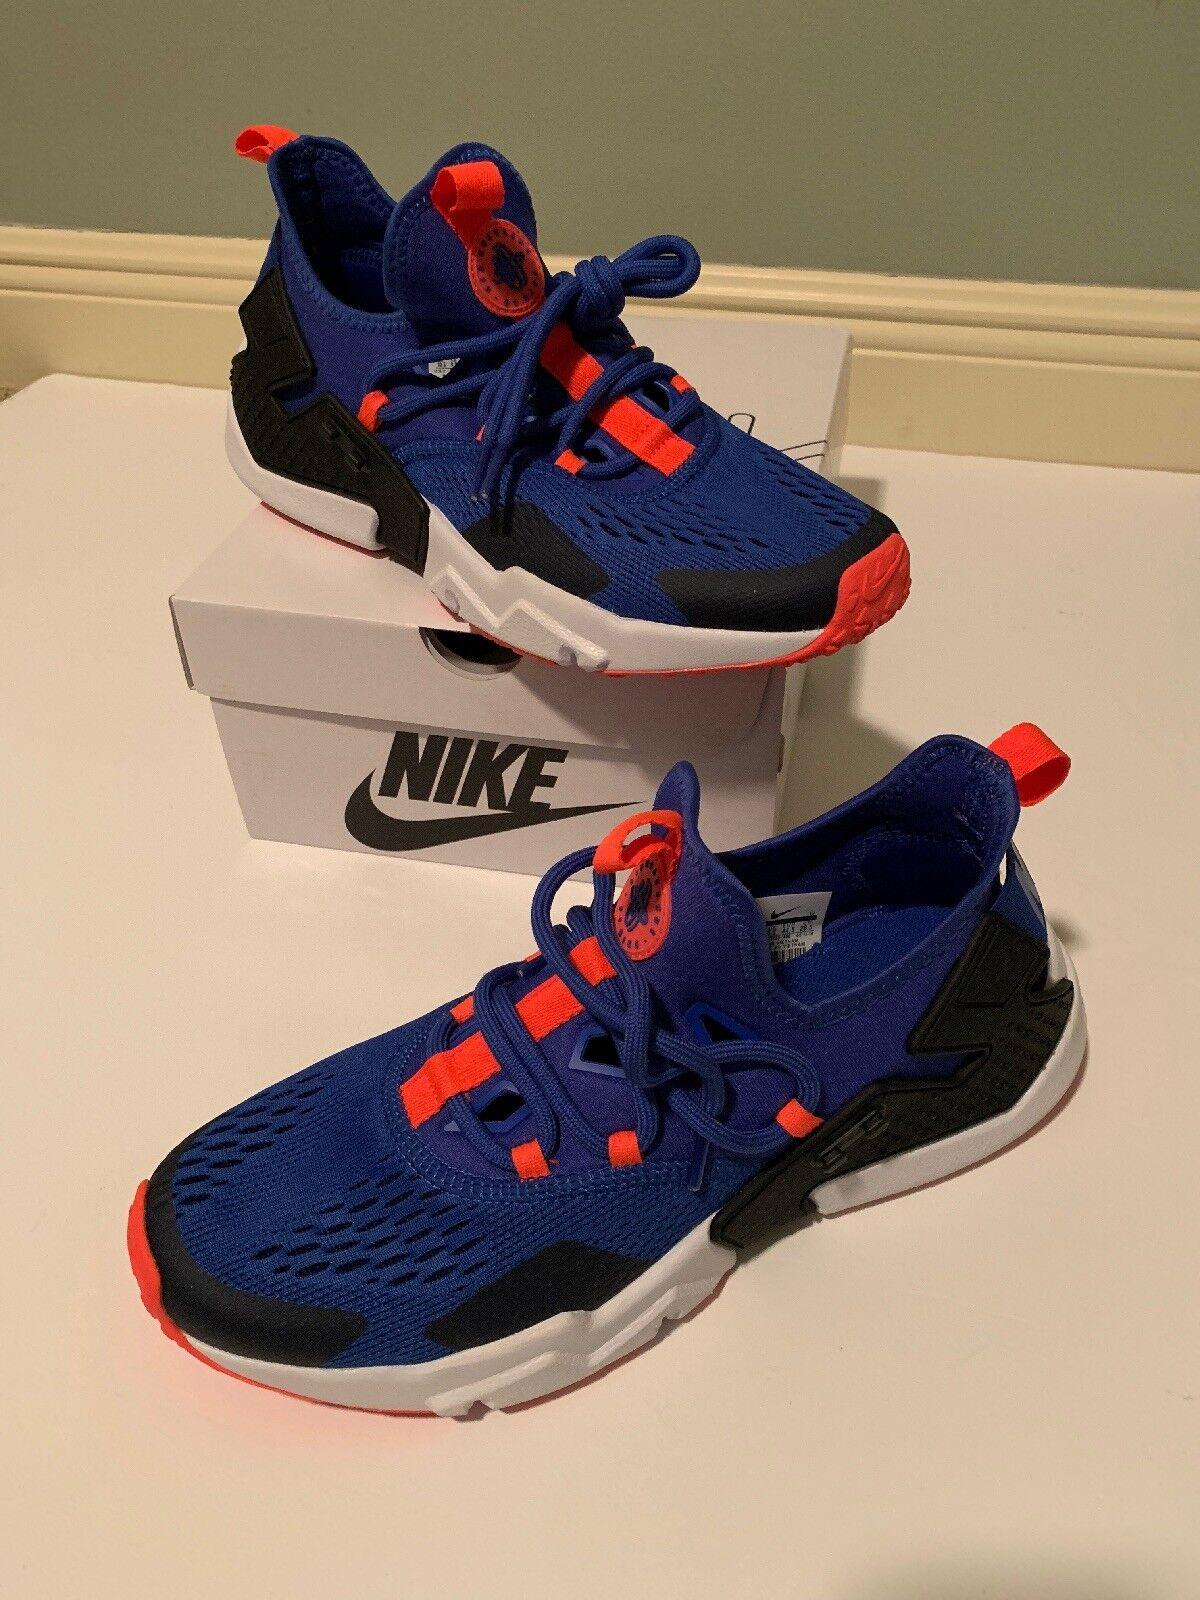 Nike Knicks Air Huarache Drift Breathe Racer blueee Mens Mesh Low-top 10.5 AO1133